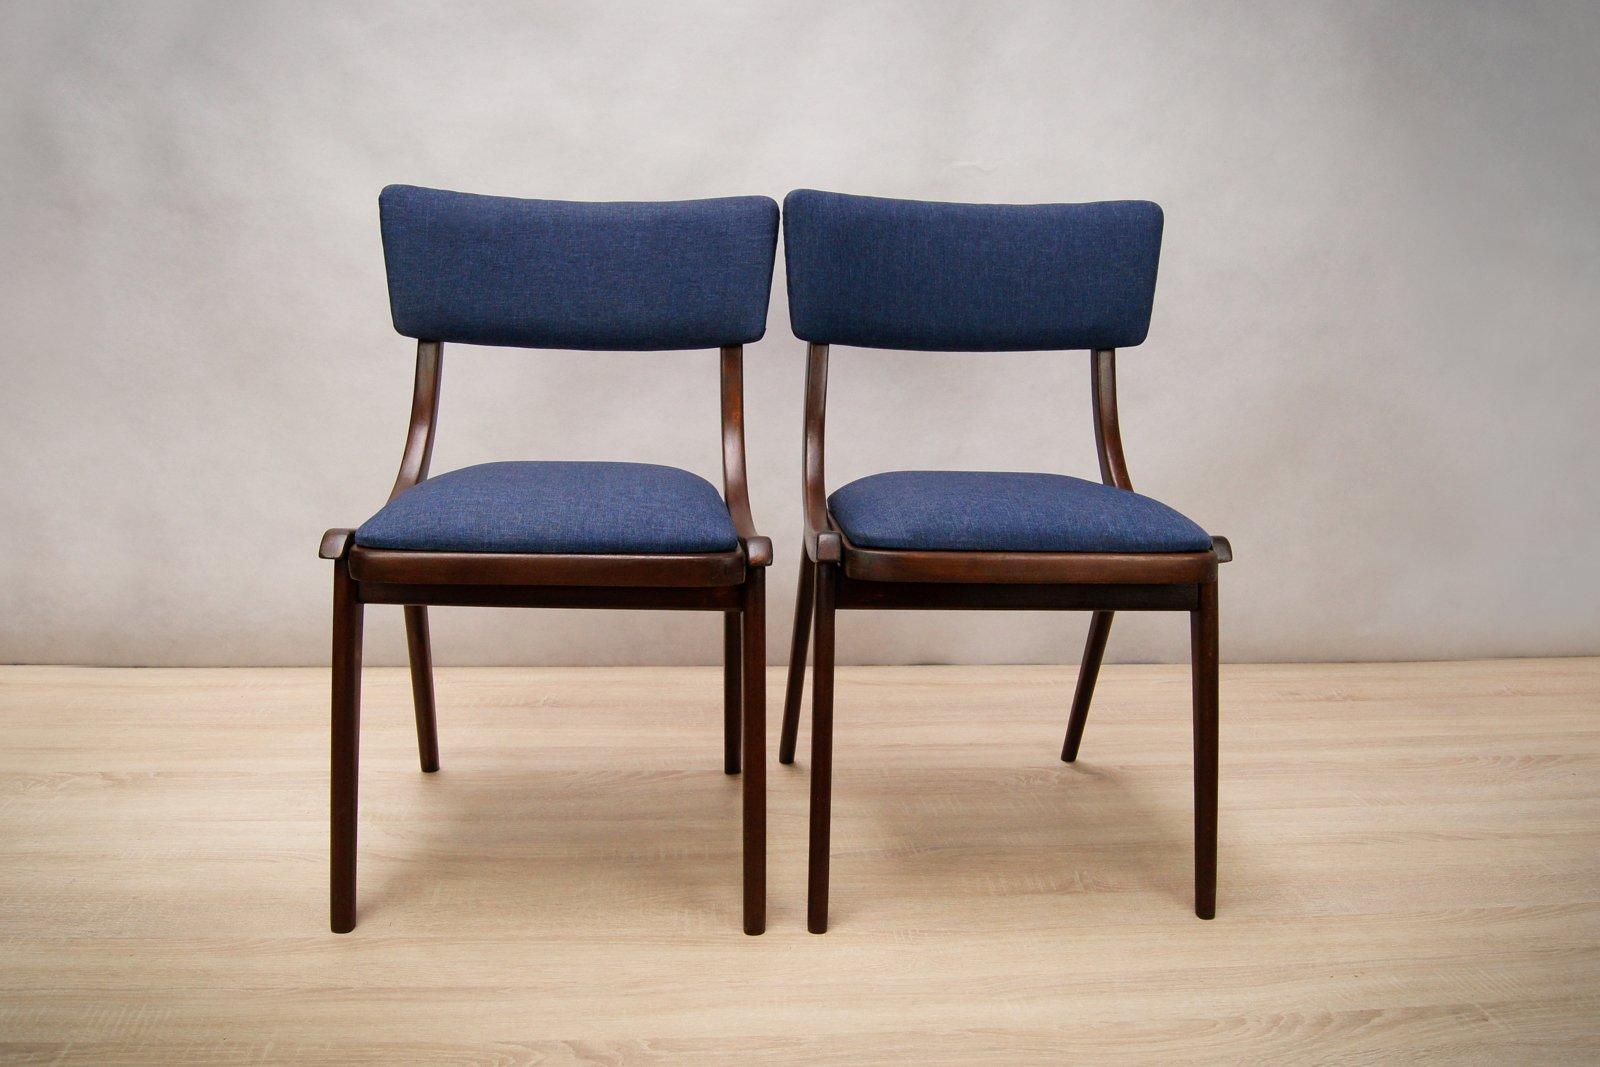 polnische jumper st he von fameg 1960er 2er set bei pamono kaufen. Black Bedroom Furniture Sets. Home Design Ideas